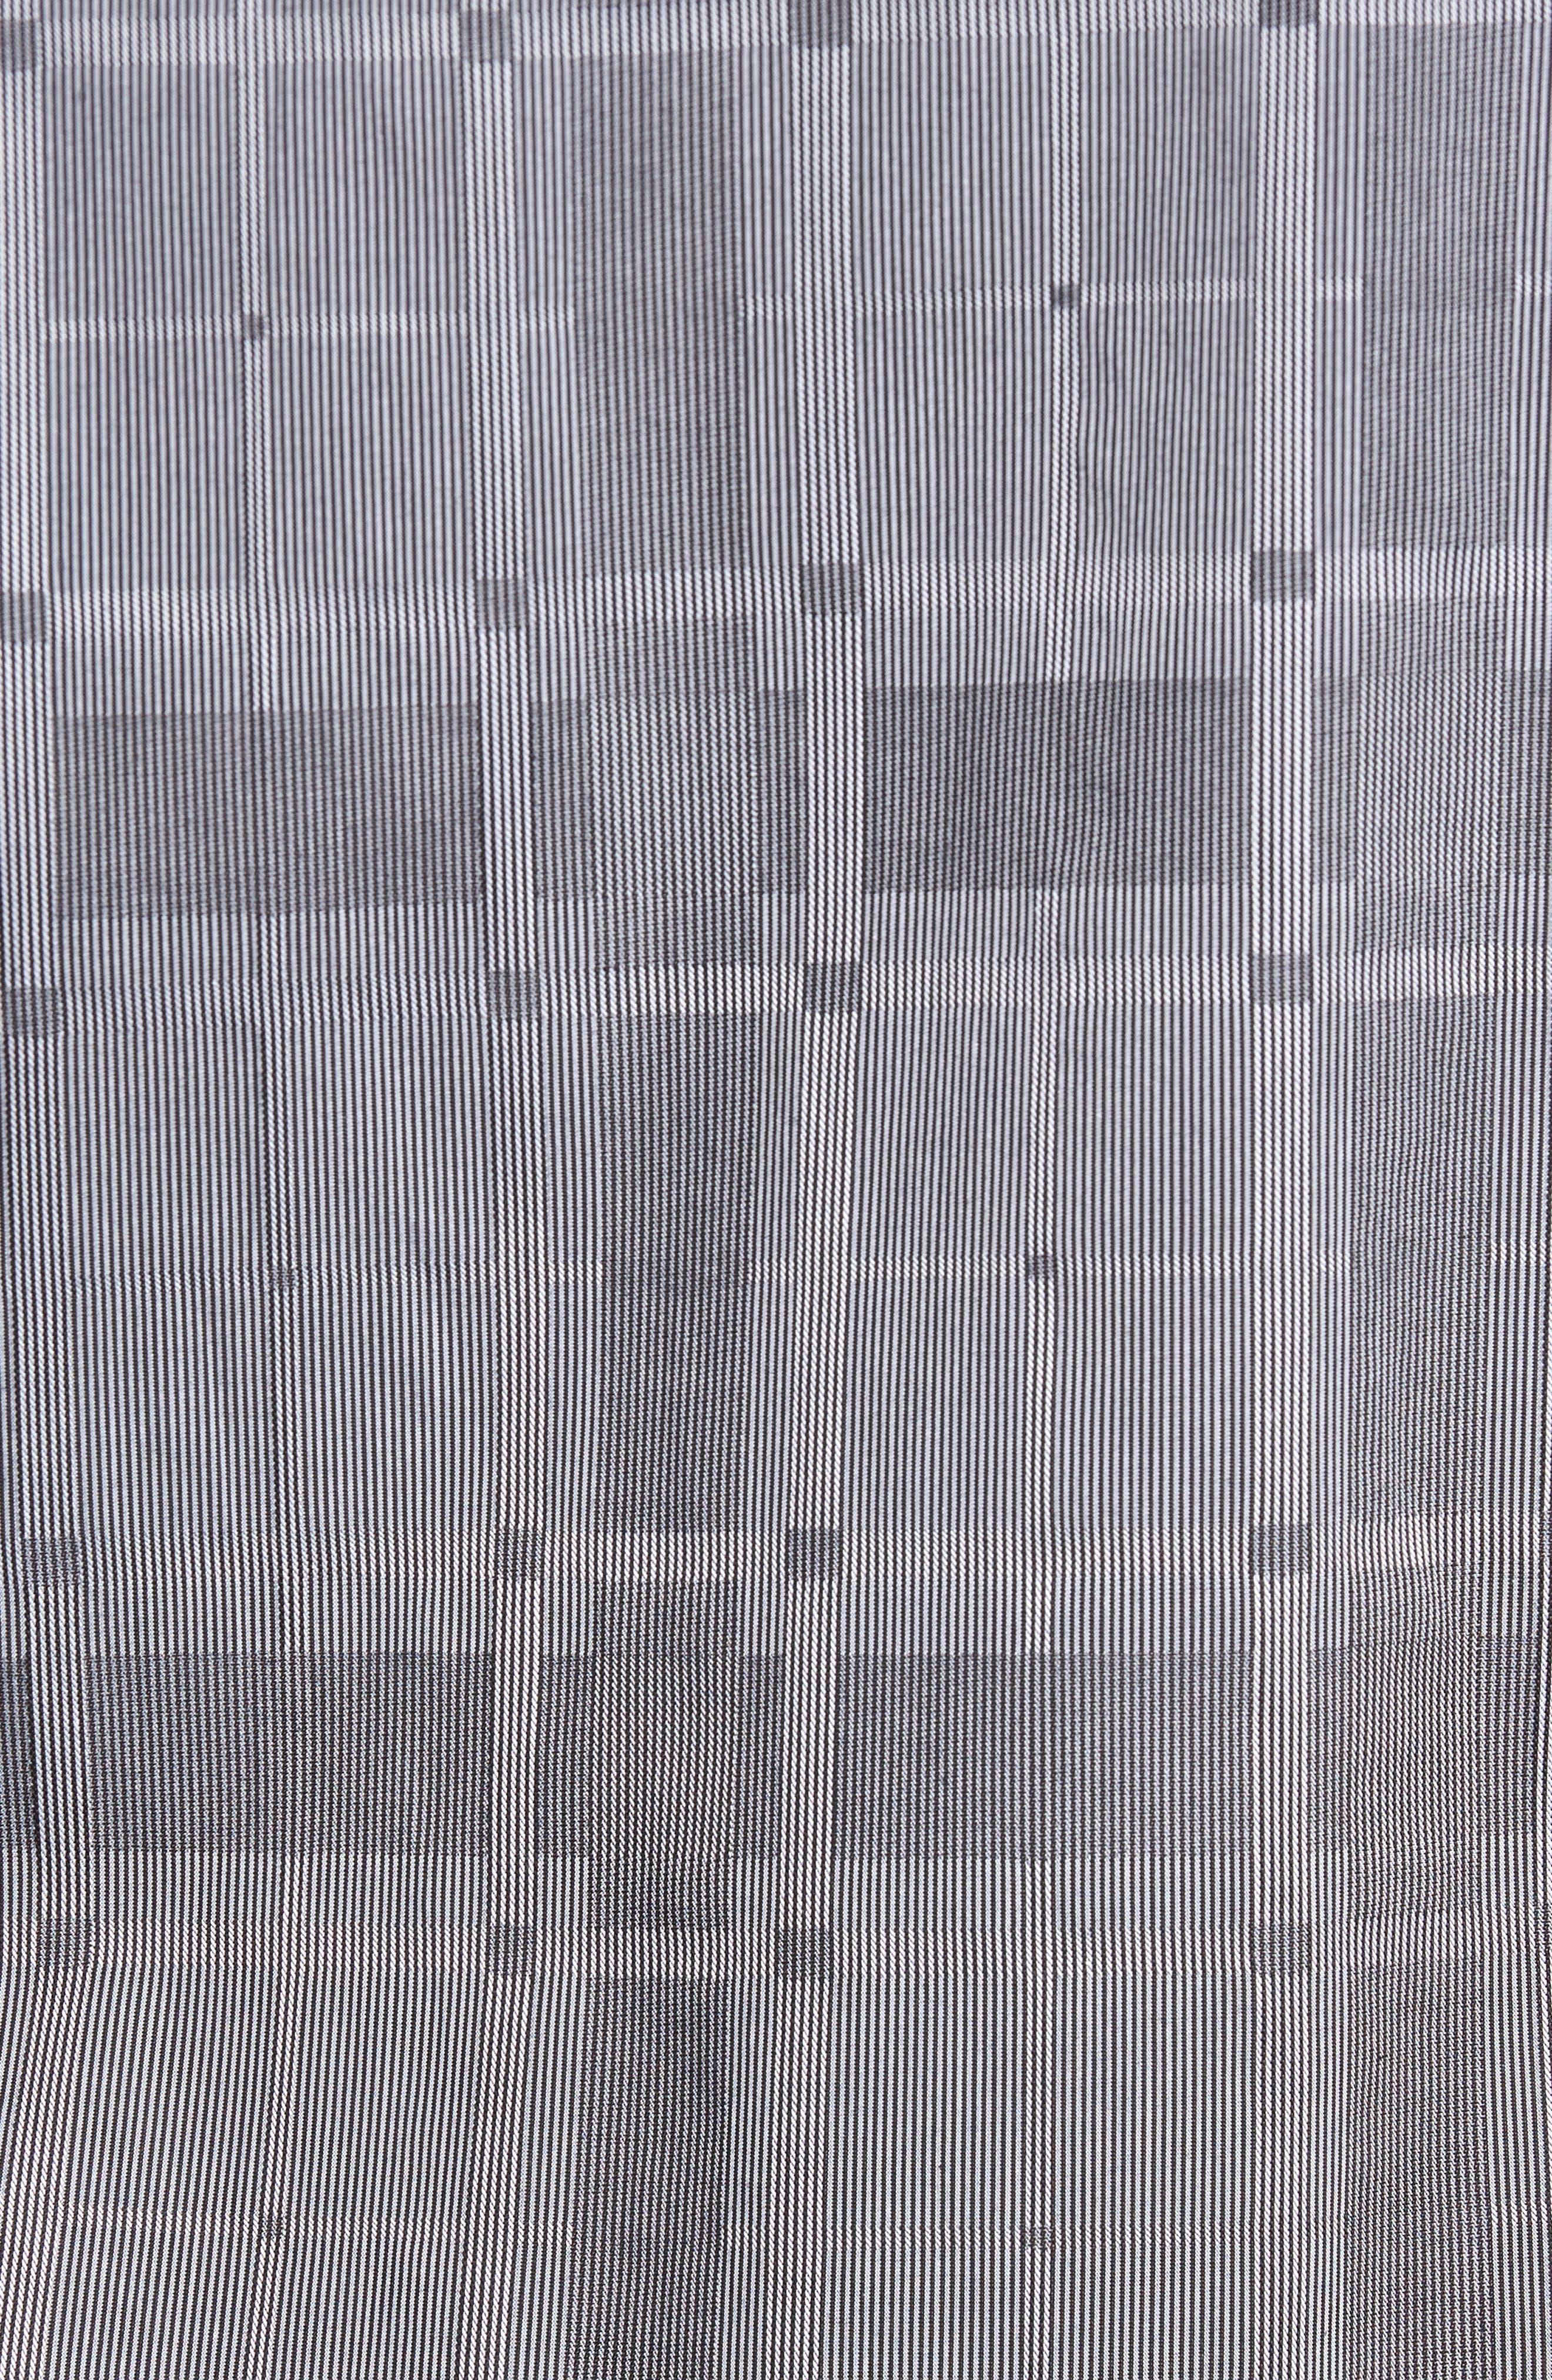 Slim Fit Microstripe Plaid Sport Shirt,                             Alternate thumbnail 5, color,                             Graphite